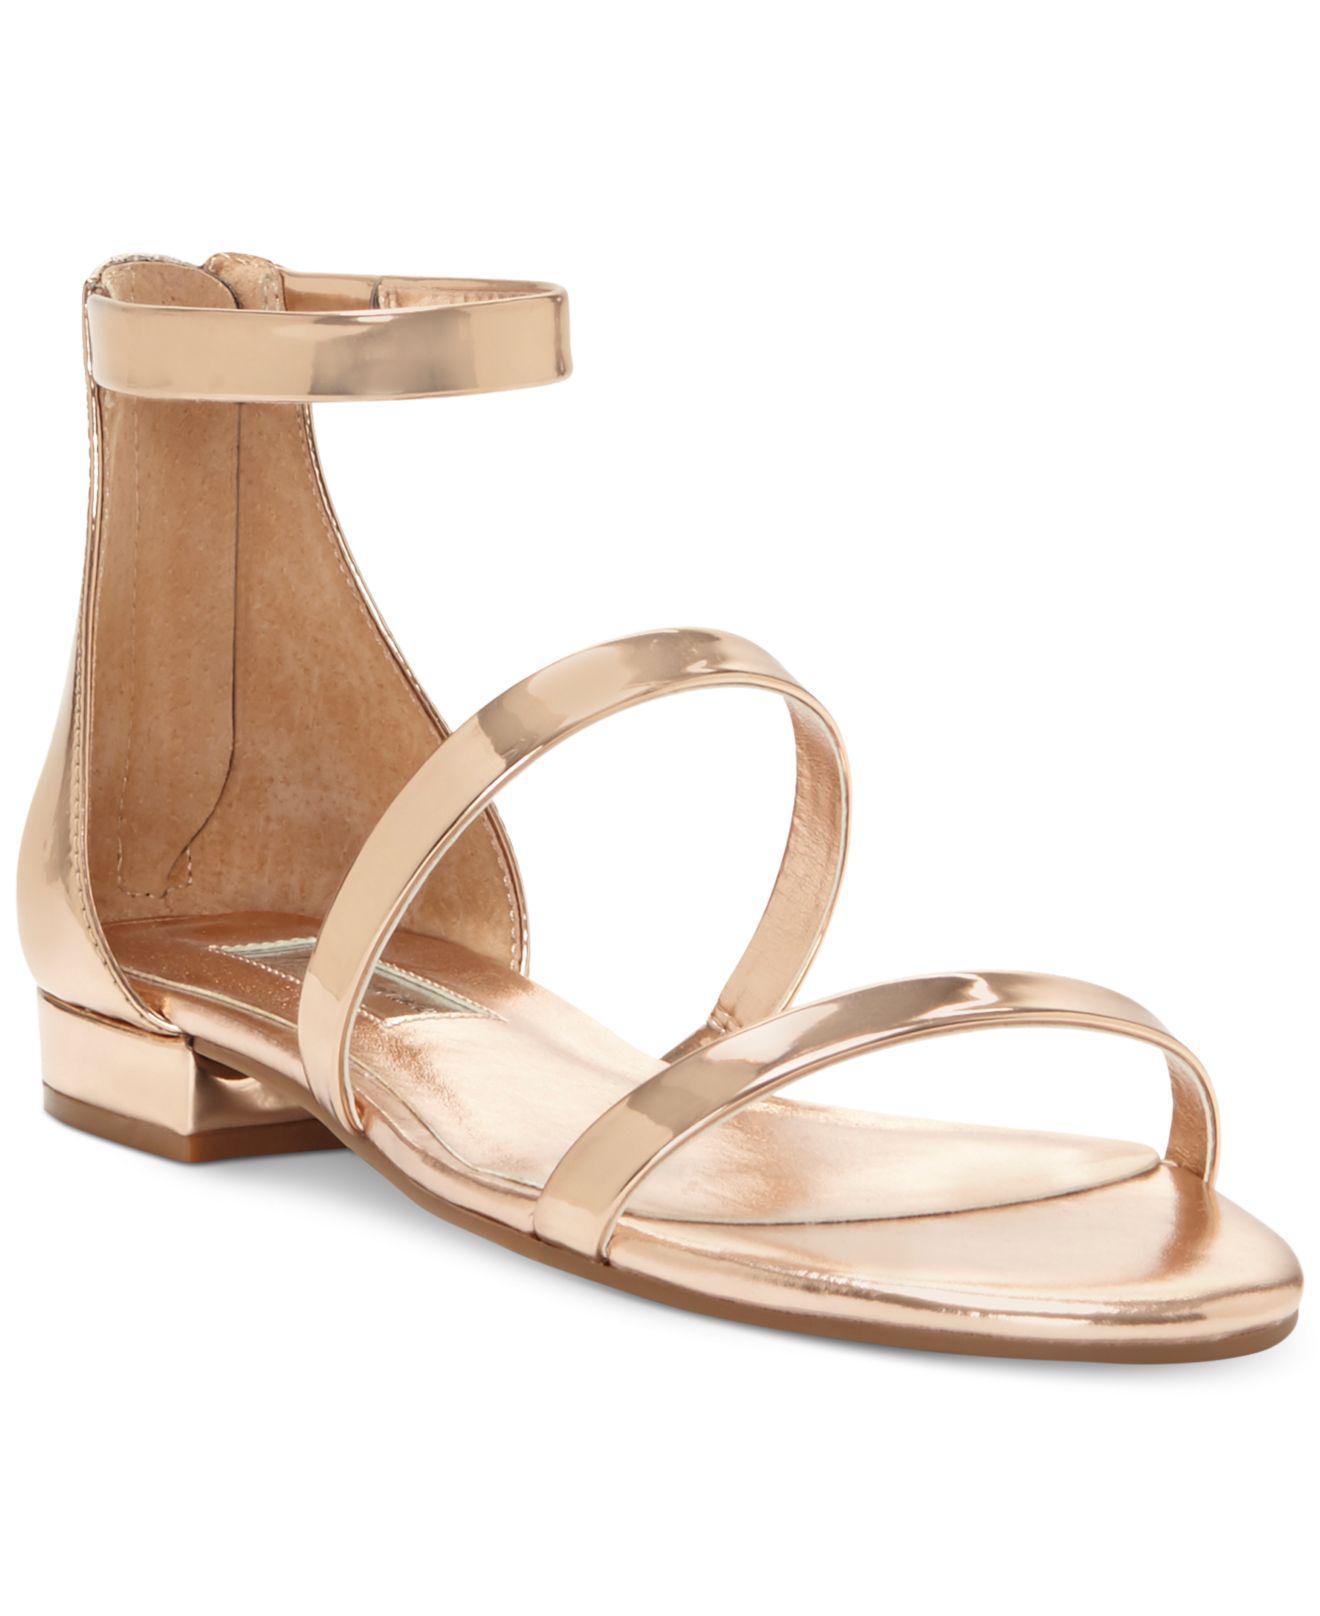 0313677c8de78 Lyst - INC International Concepts Yessenia Strappy Flat Sandals ...